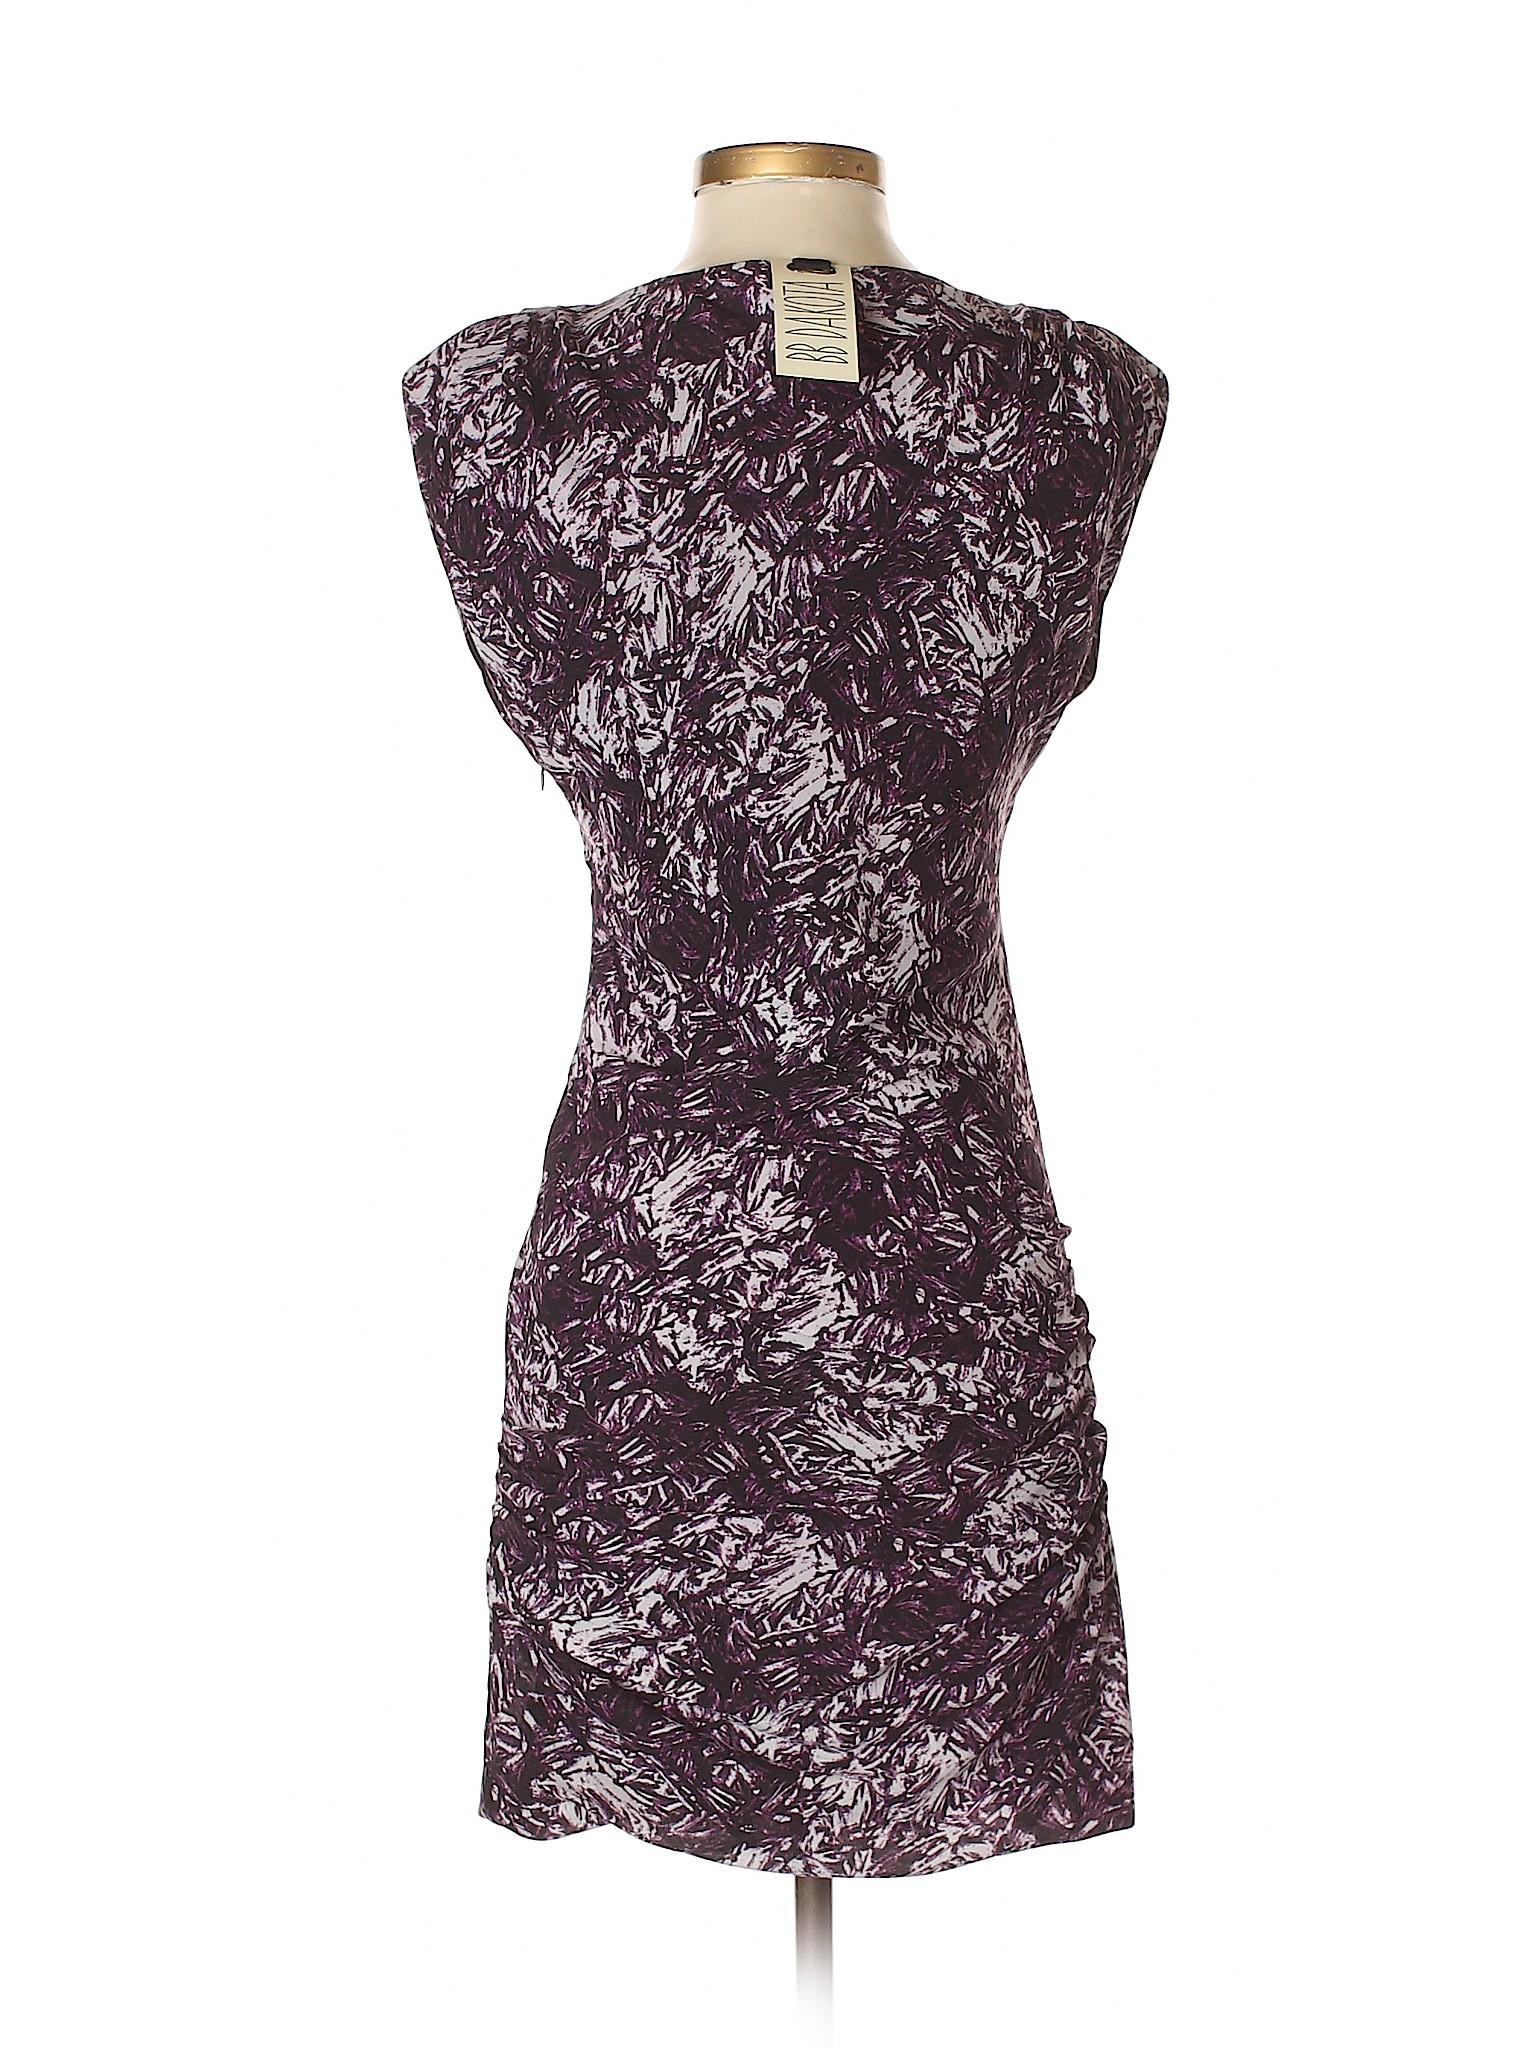 Dress Boutique Casual Dakota winter BB 6w6YqAC